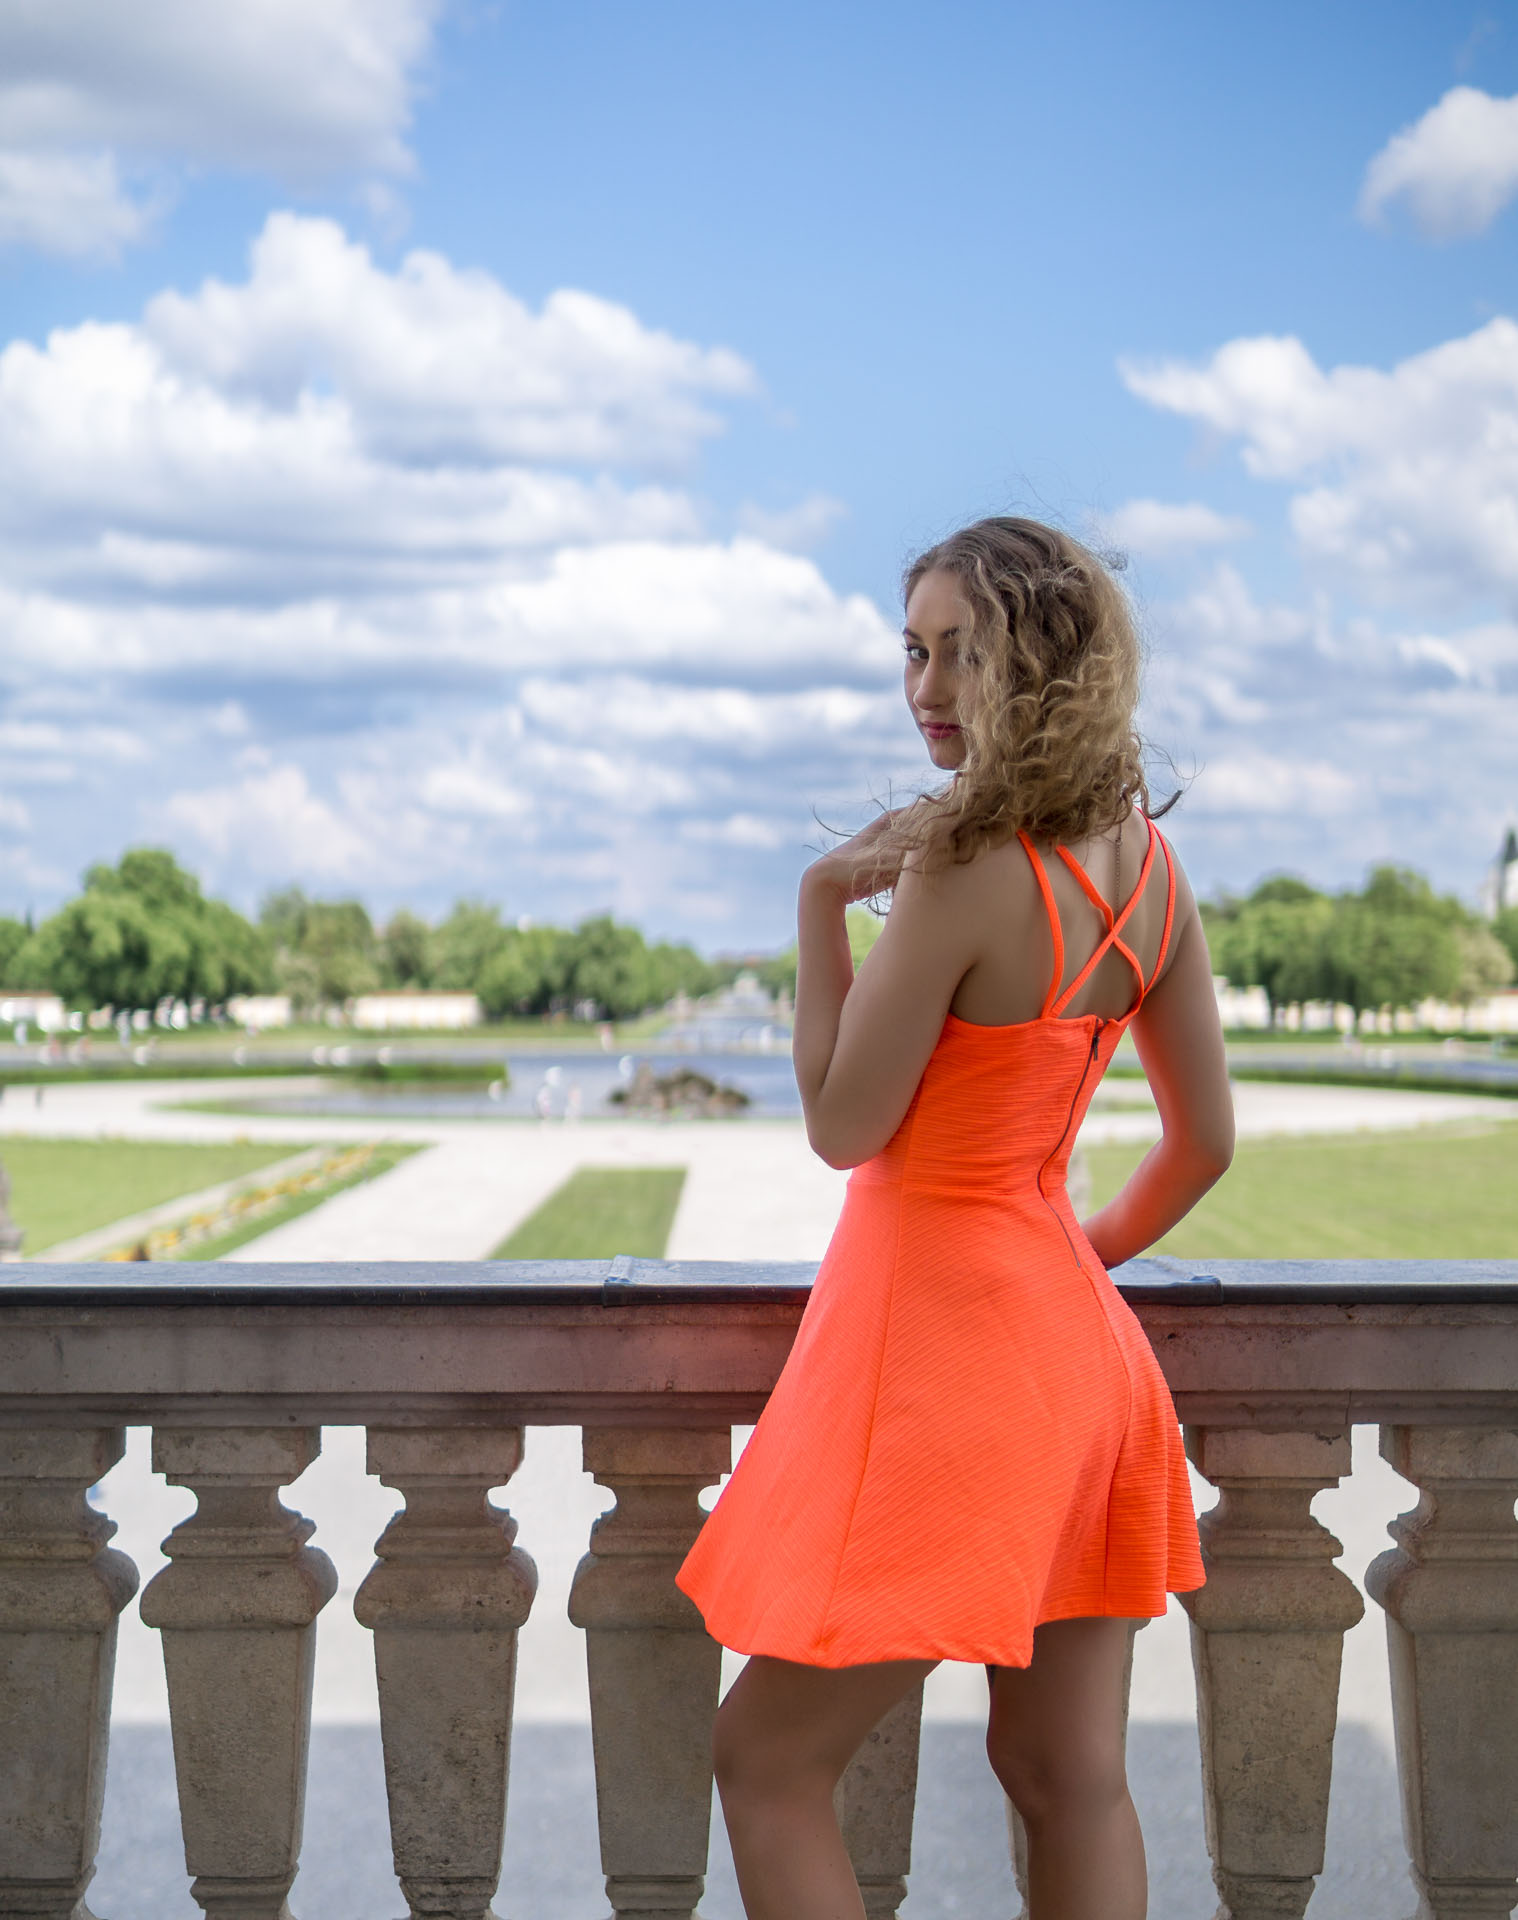 Laura steht am Balkon des Schlosses